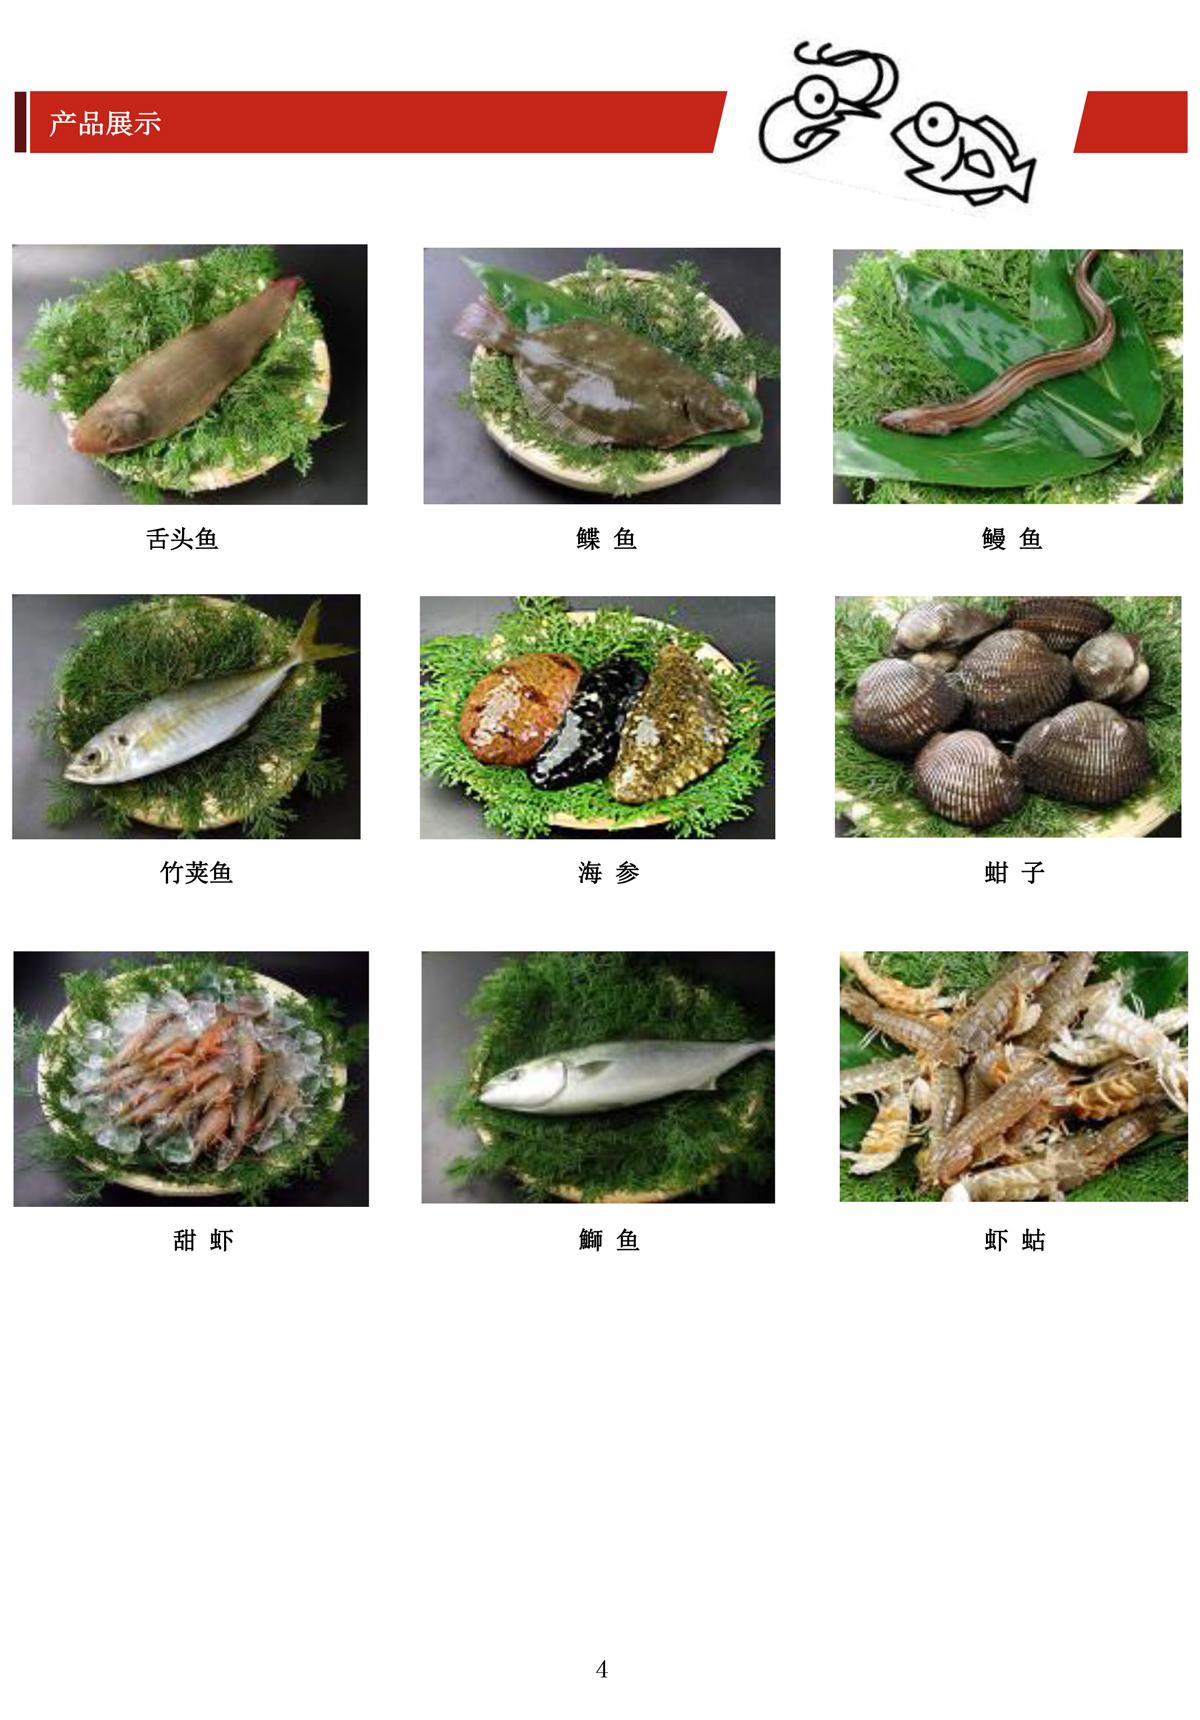 http://www.harikai.com/images/material/Page4.jpg